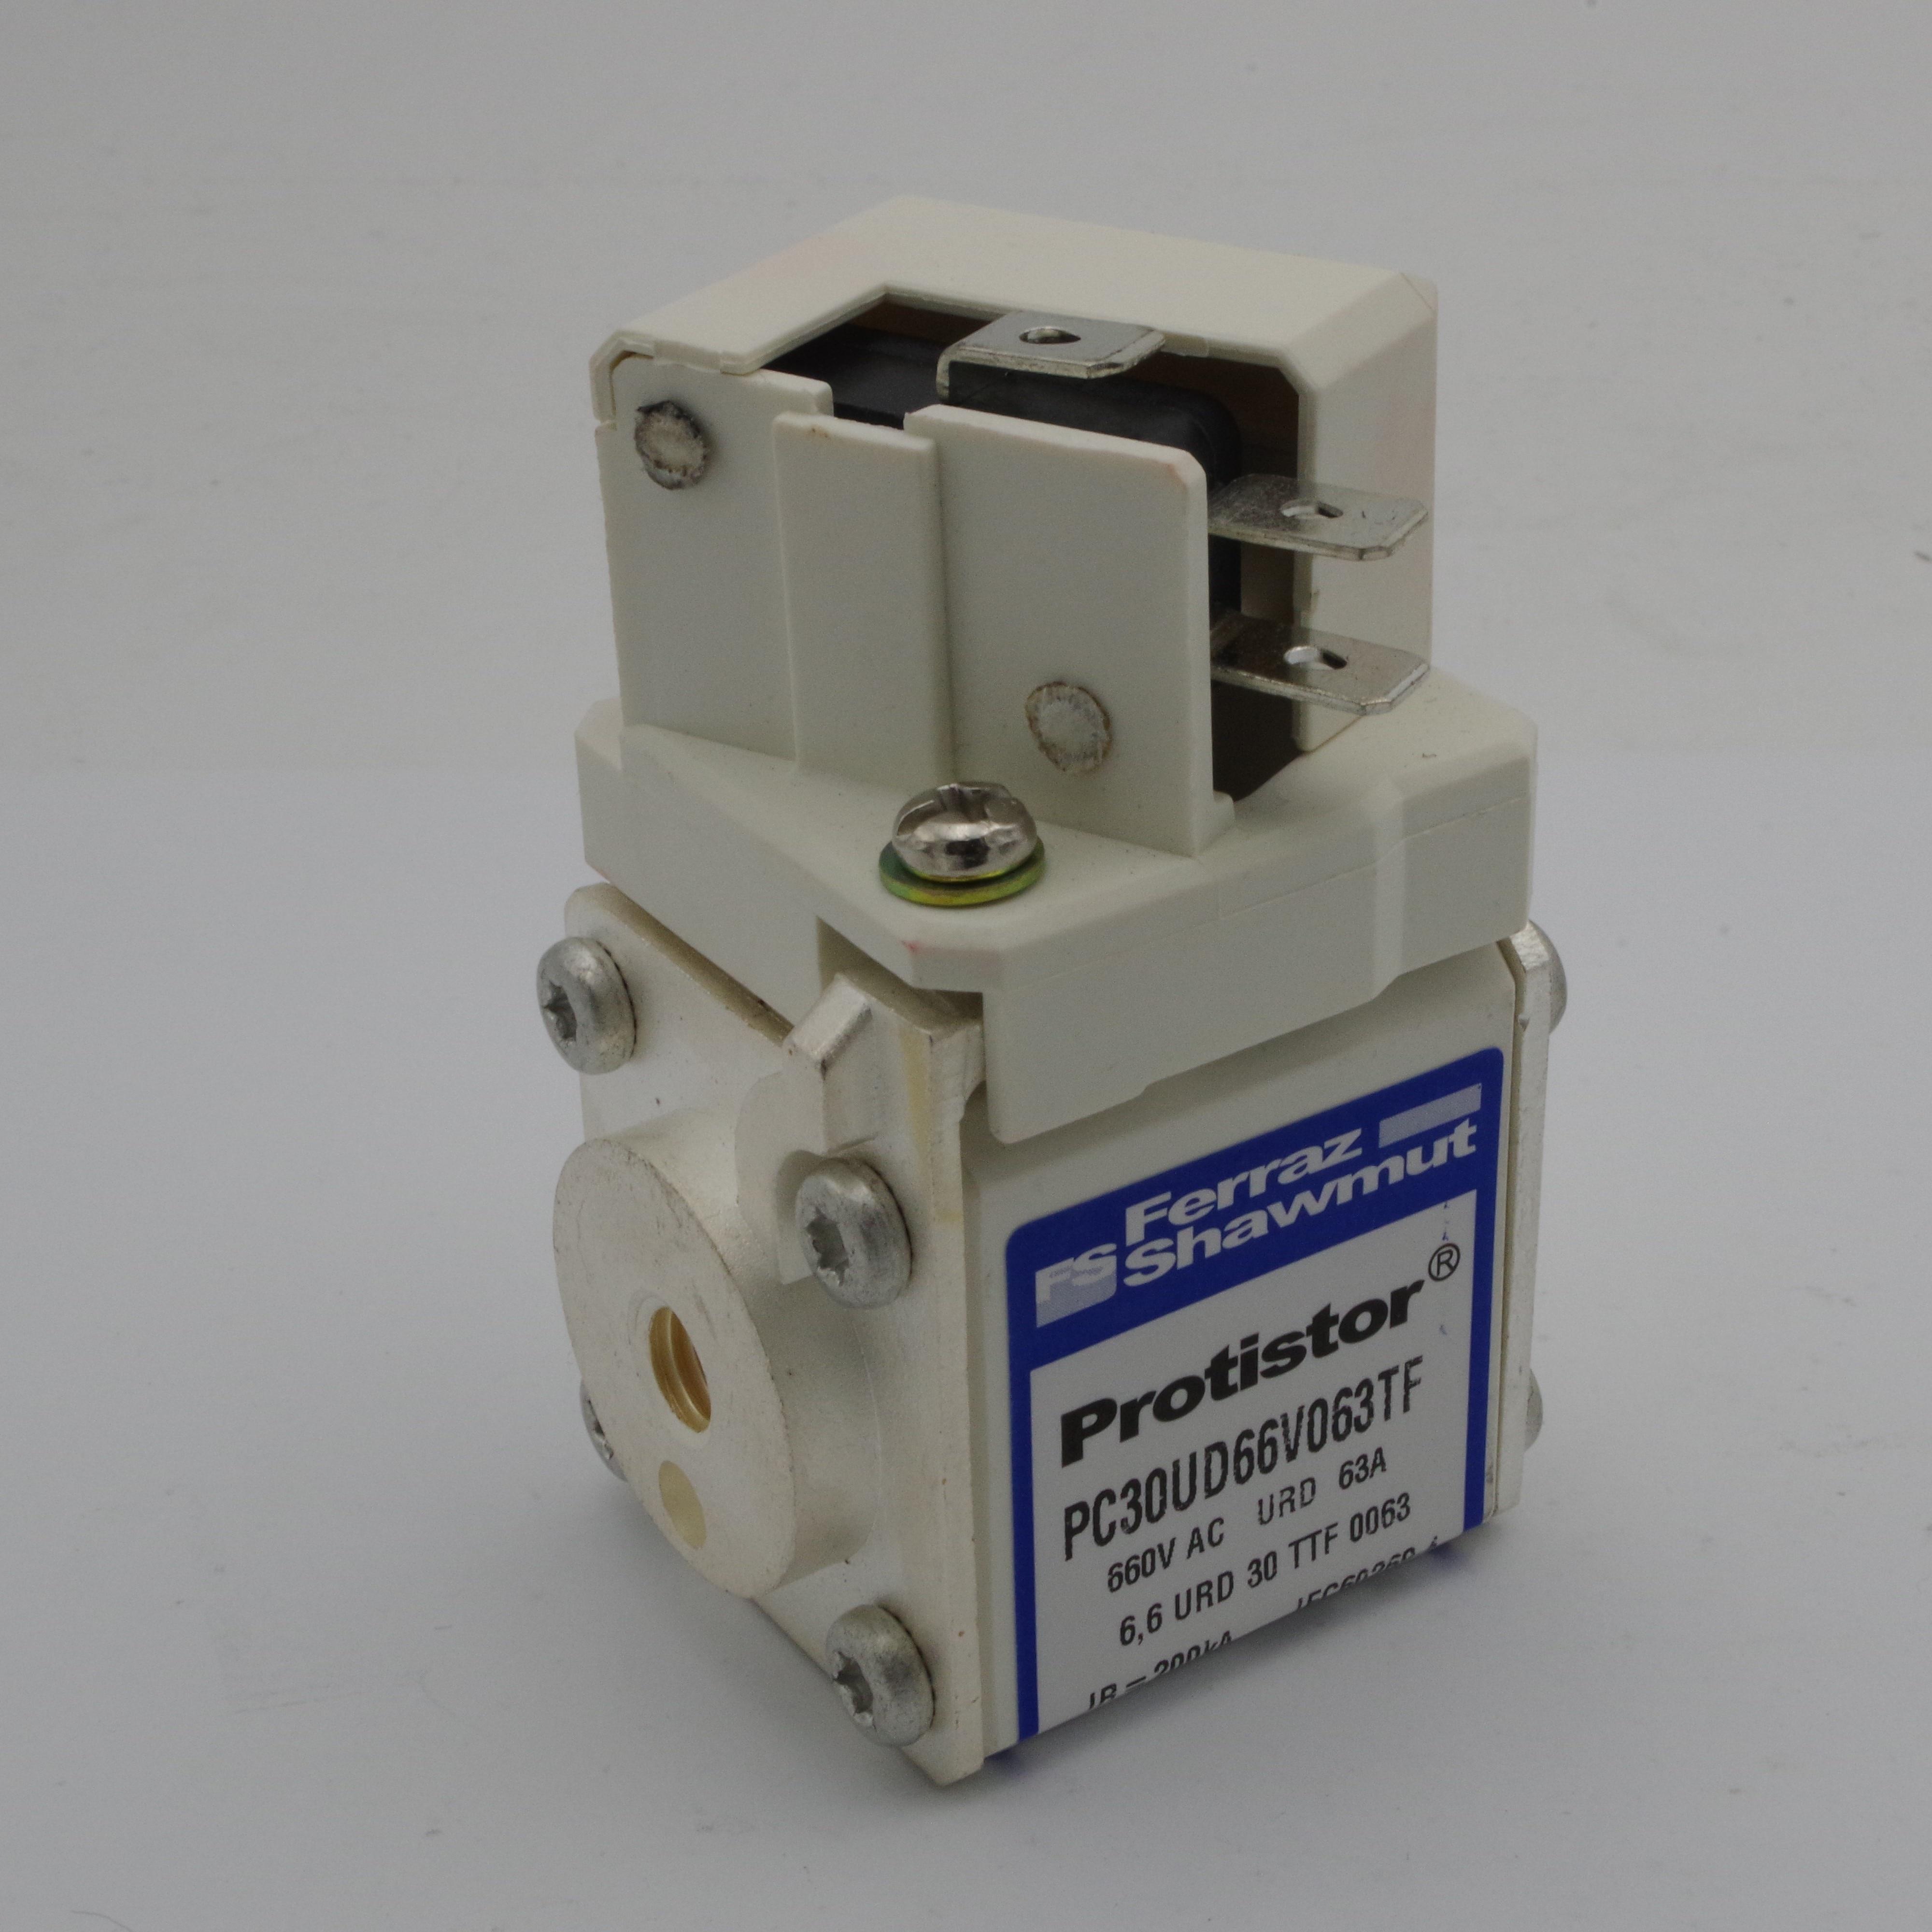 3 uds. PC30UD69V63TF Ferraz Shawmut fusible 63A 690V, fusible de alimentación para interruptor de protección eléctrica